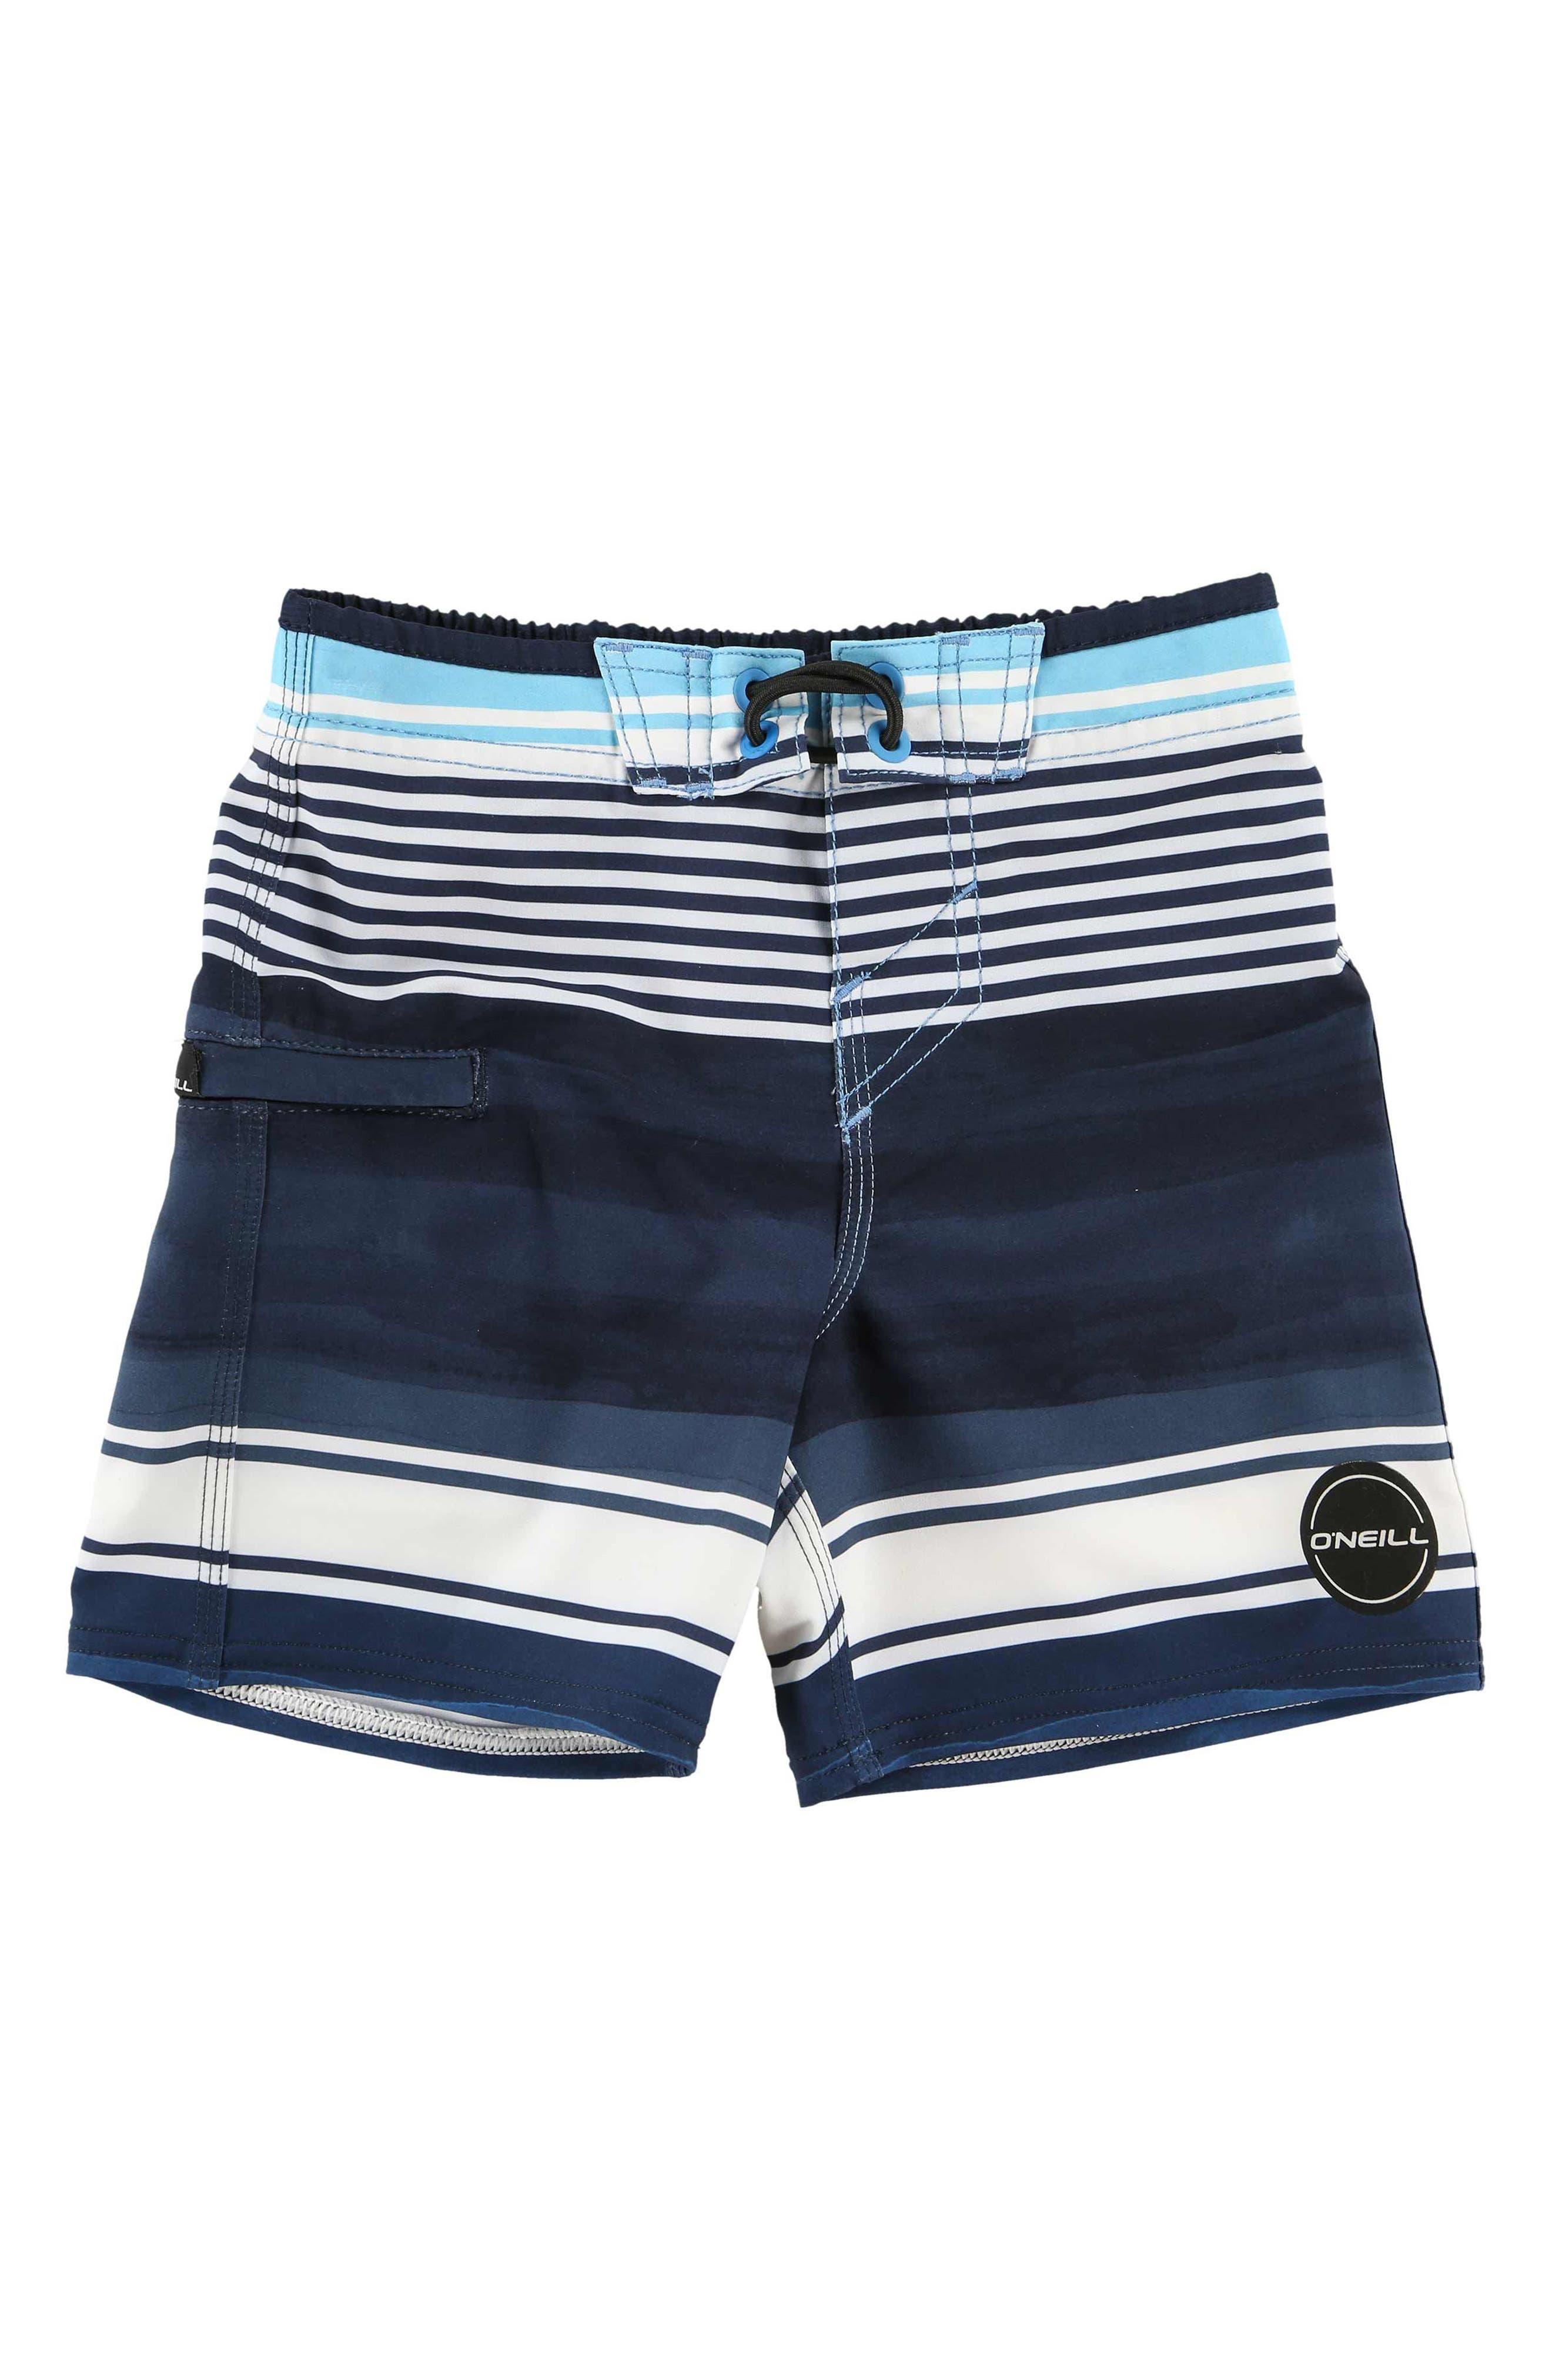 Hyperfreak Heist Board Shorts,                         Main,                         color, Navy